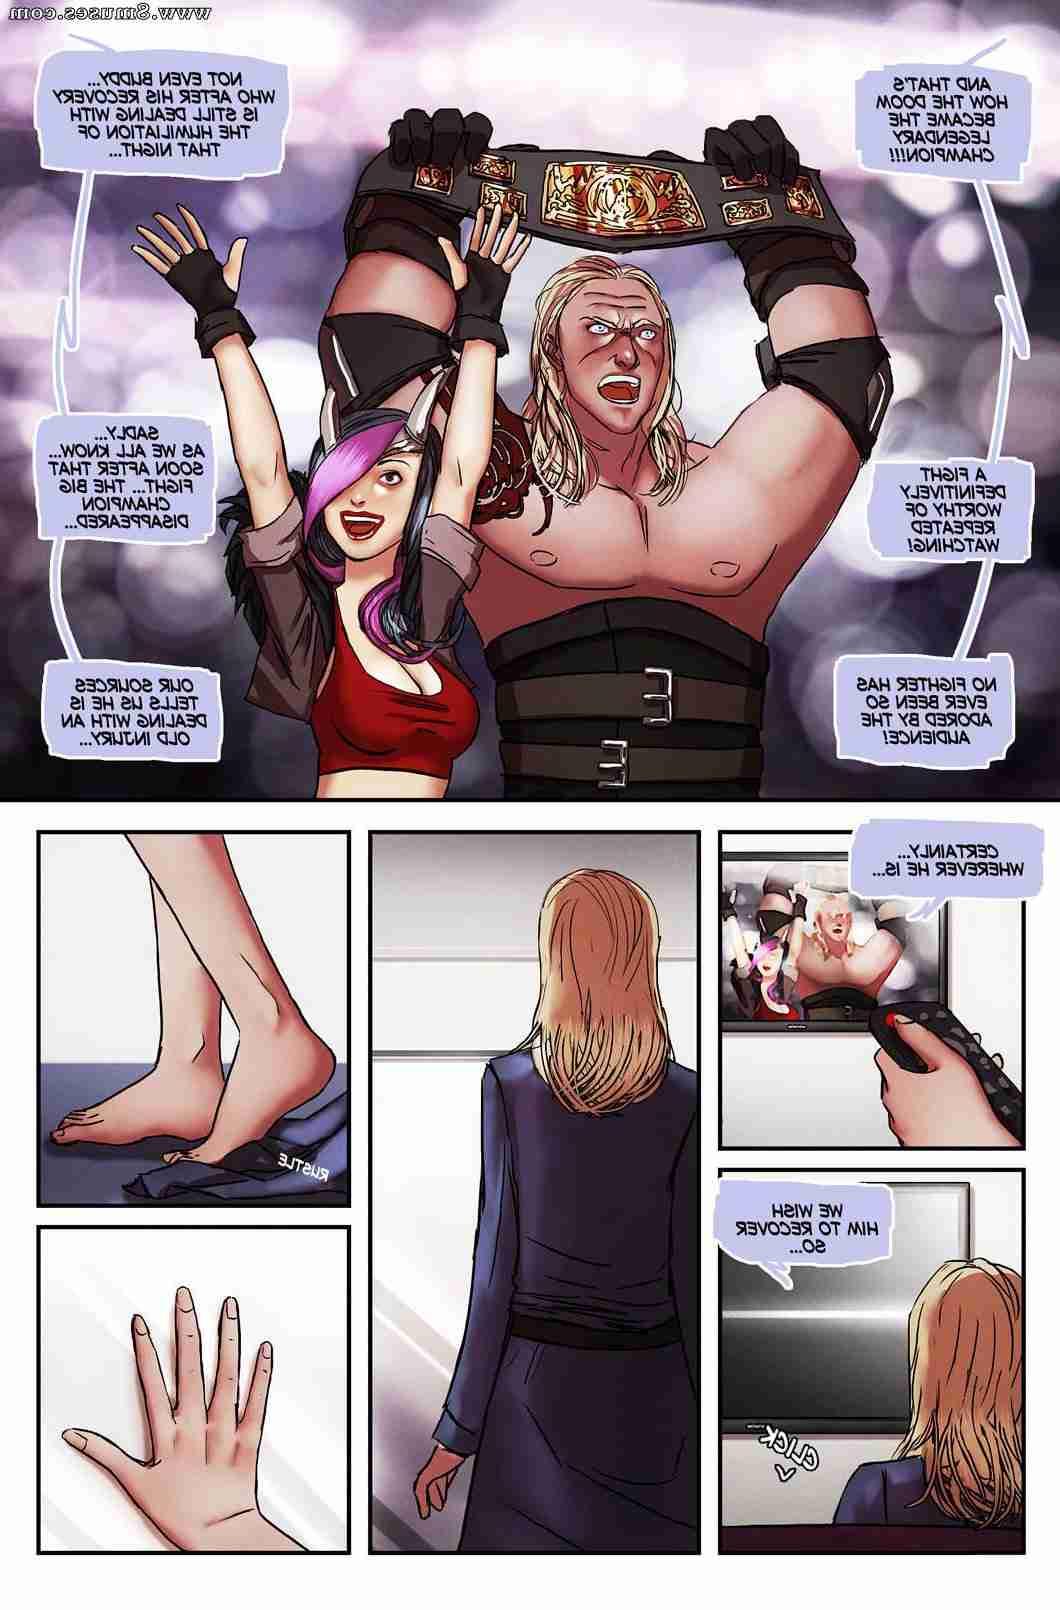 TG-Comics/Kannel/The-Heel The_Heel__8muses_-_Sex_and_Porn_Comics_4.jpg